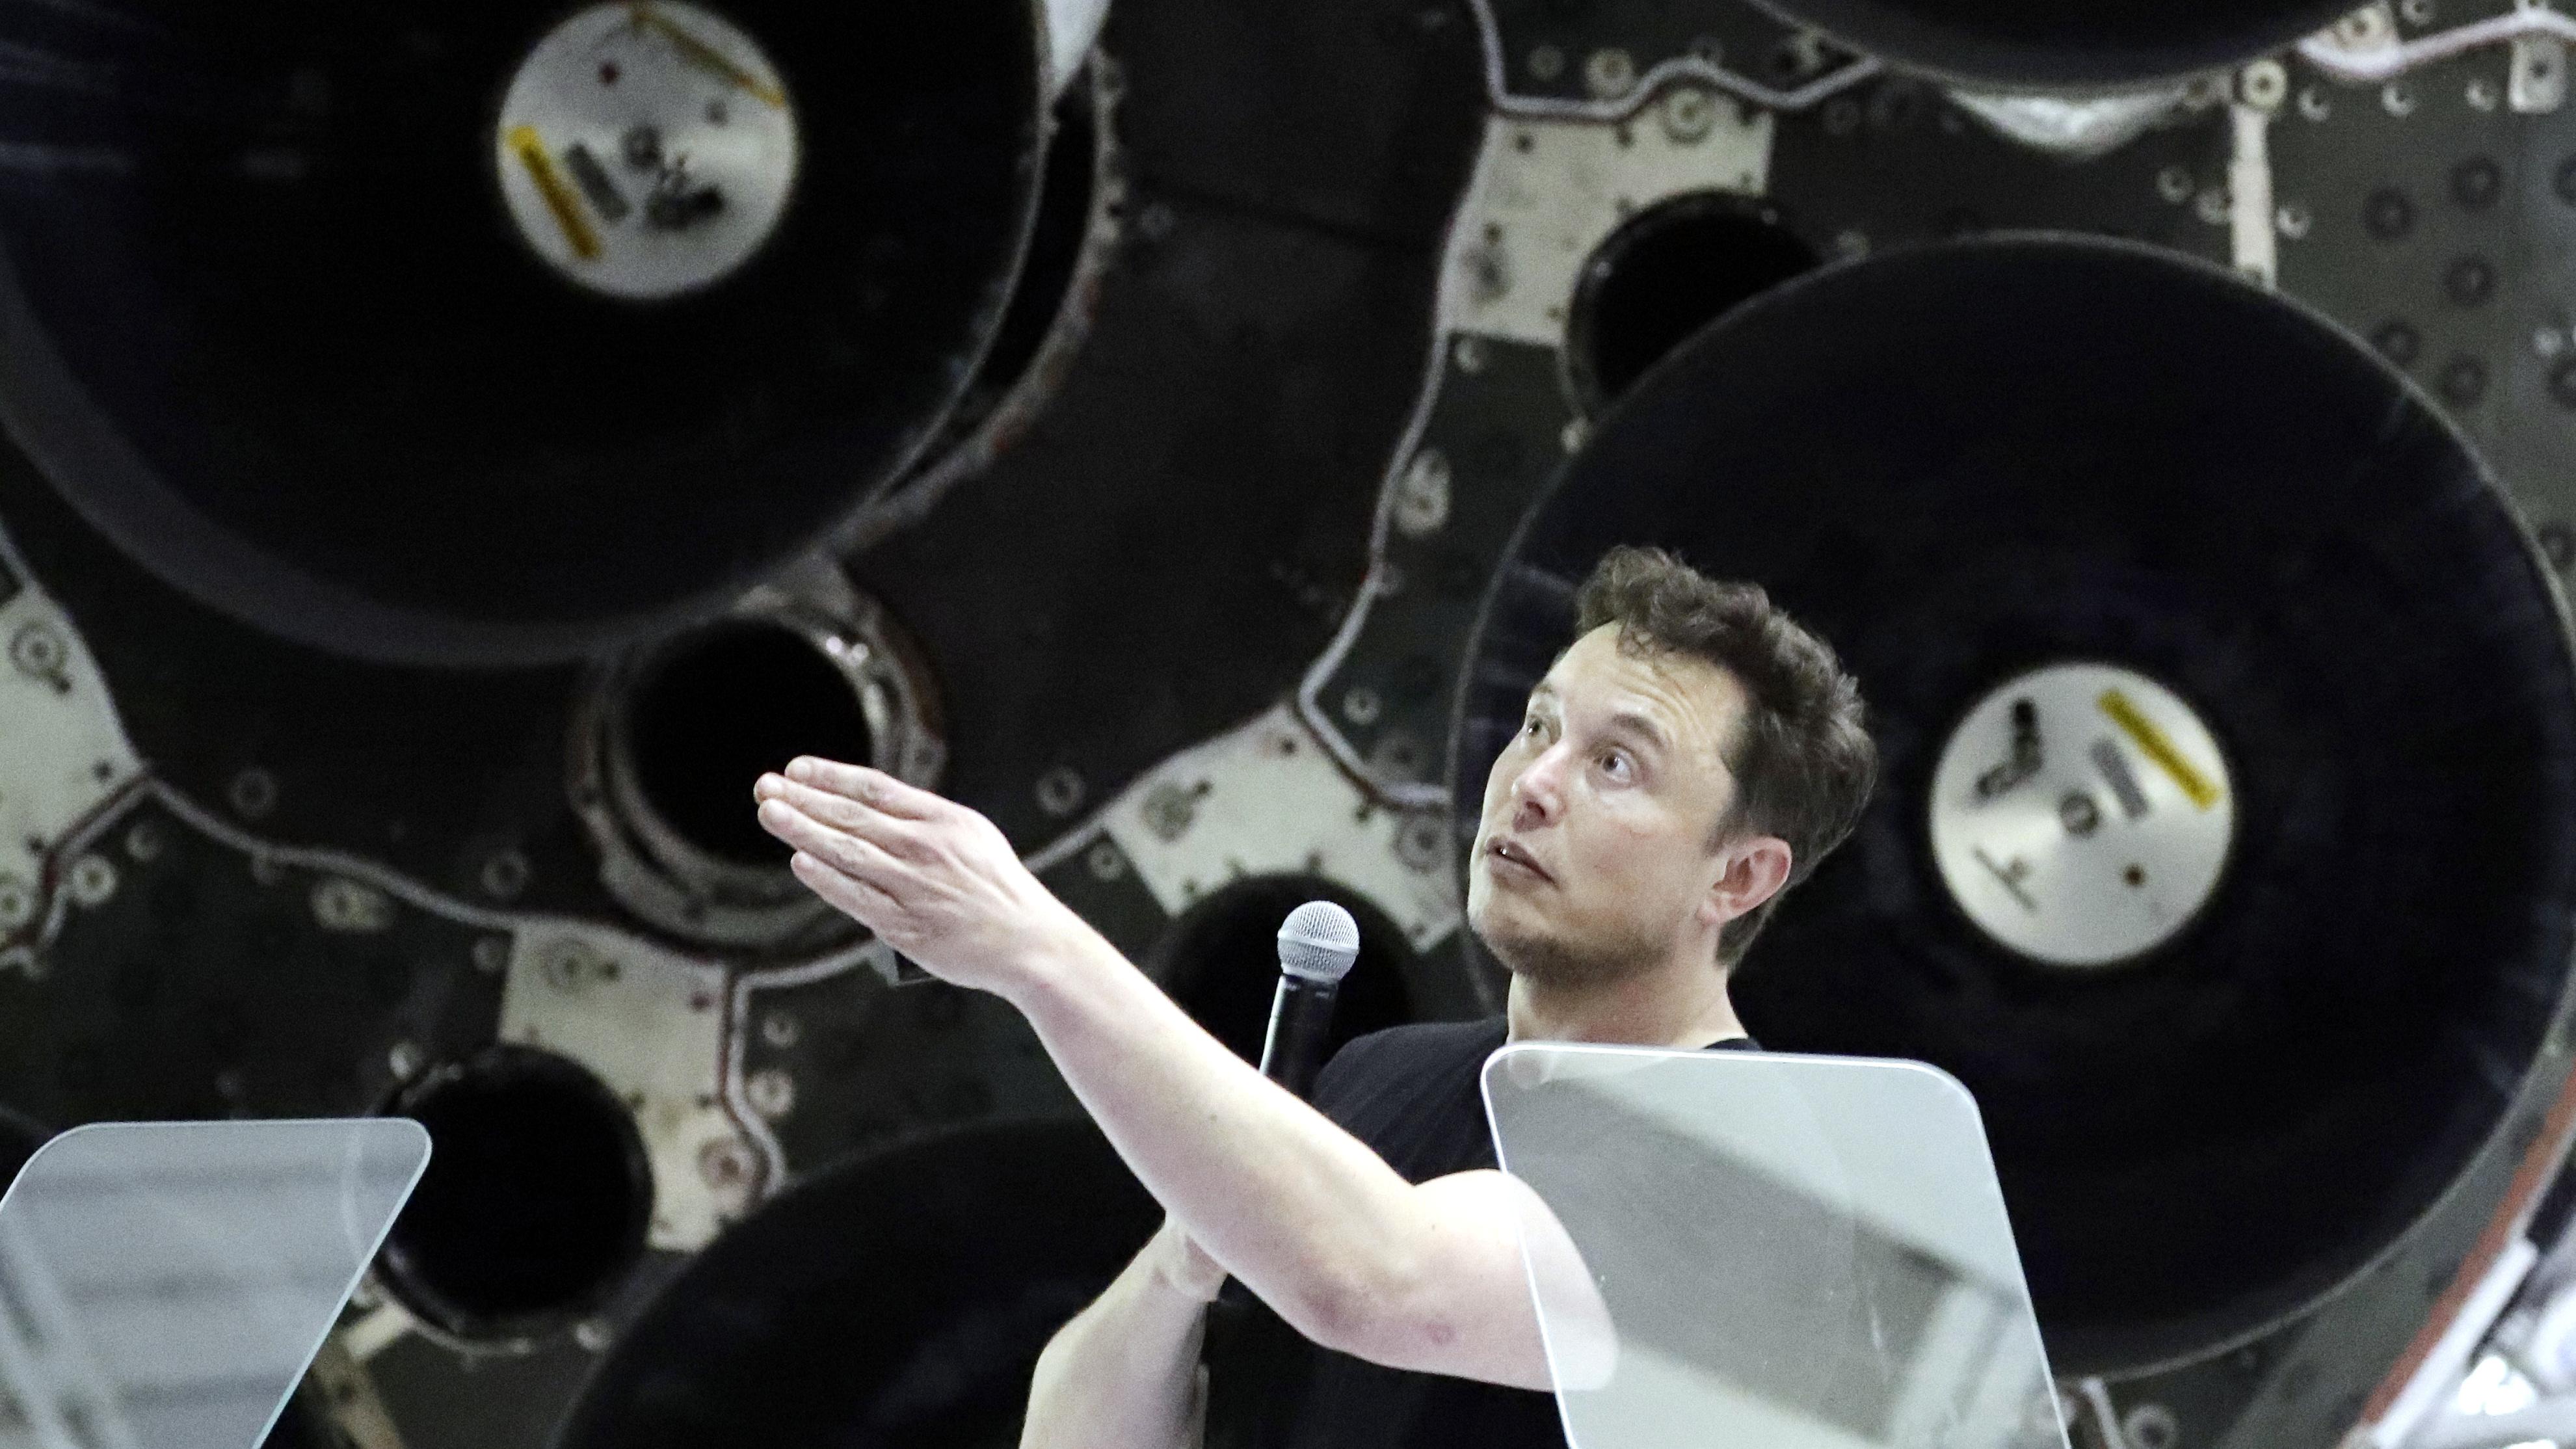 Elon Musk S Spacex Details Starlink And Bfr Quartz